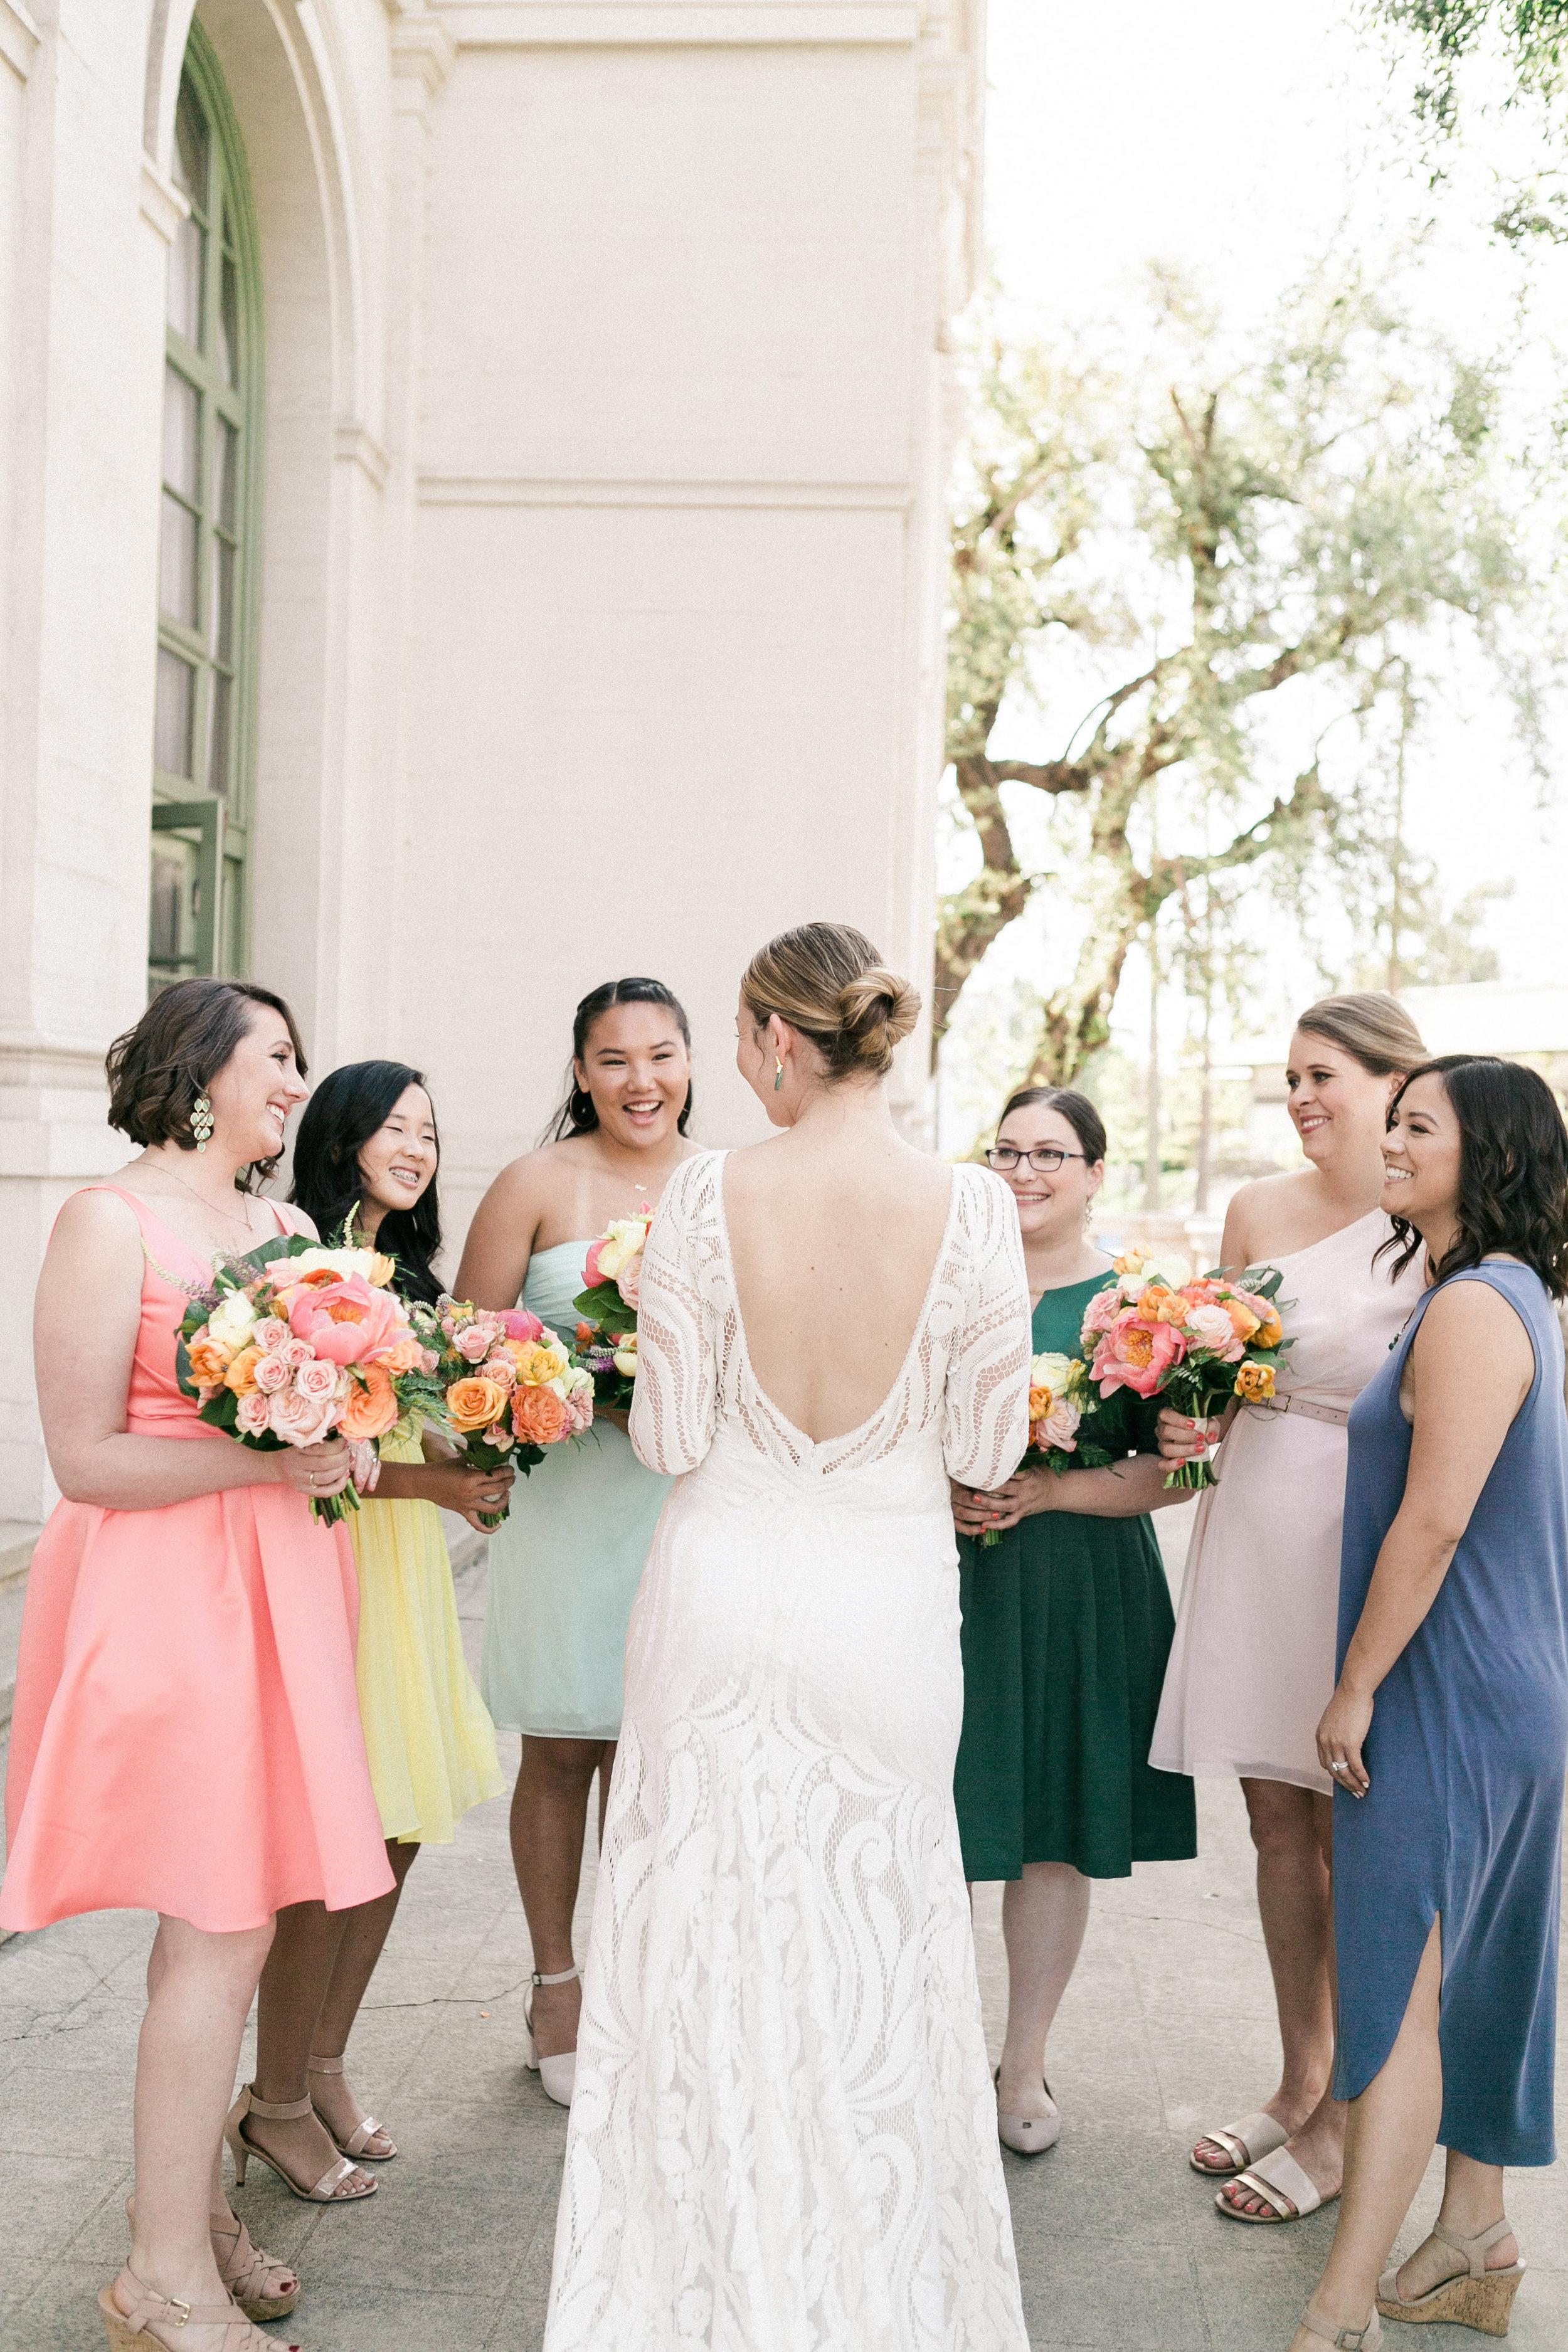 cluster events - julia and adam wedding 2.jpg